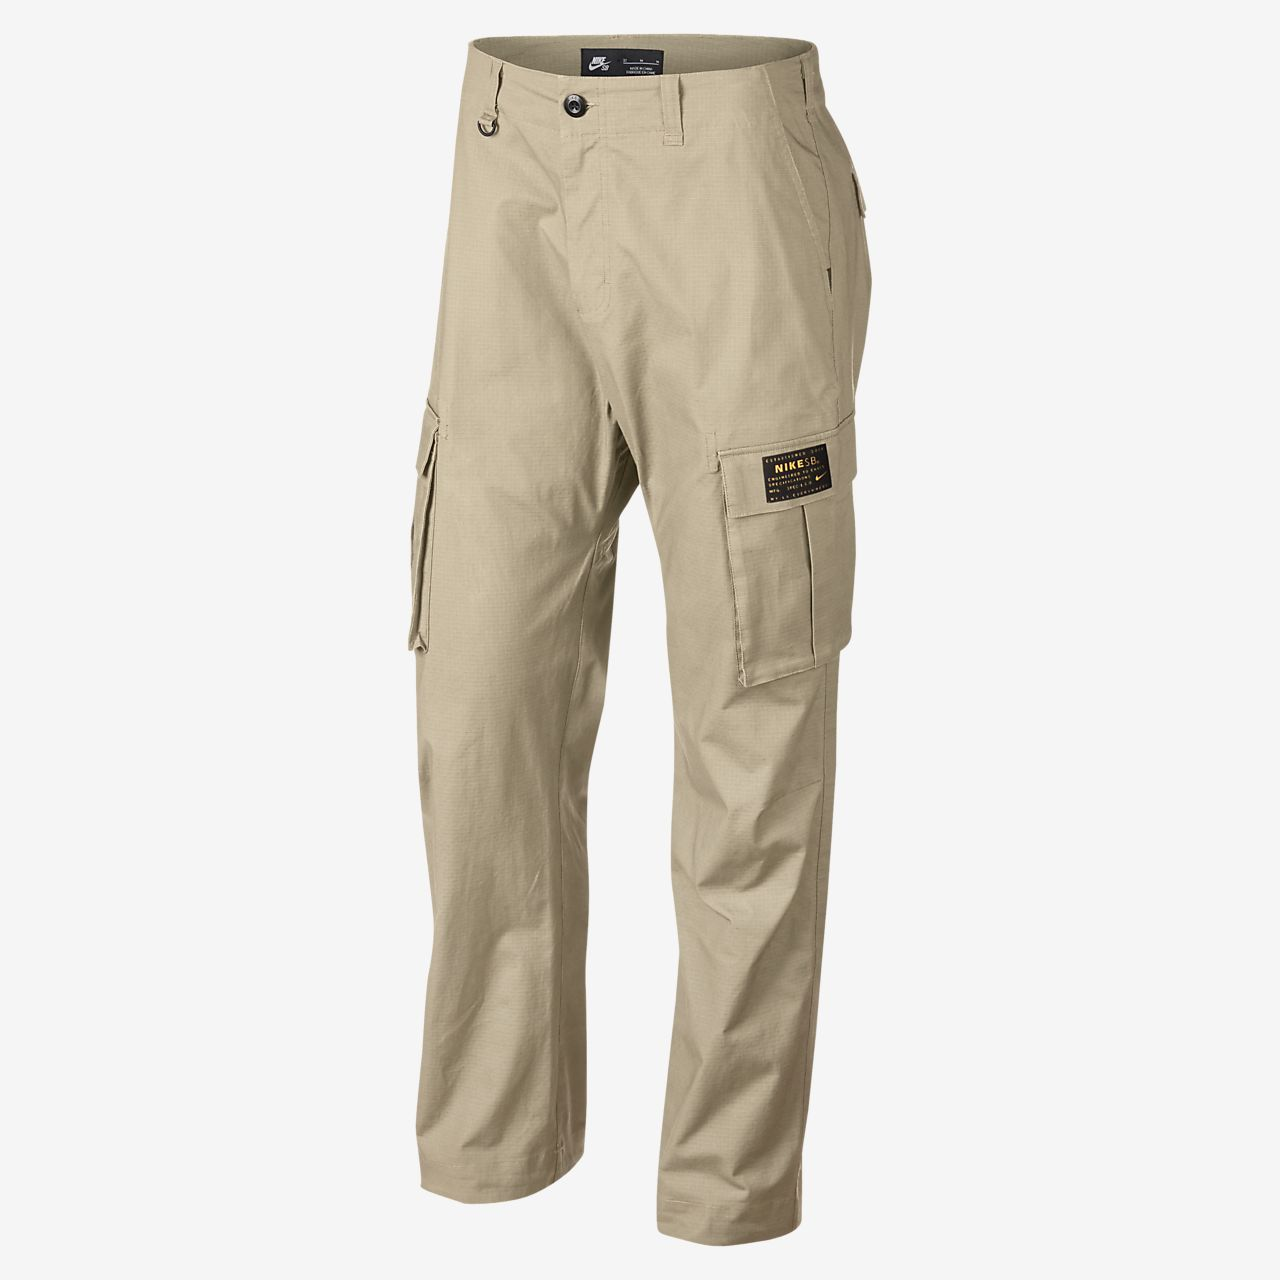 Мужские брюки карго для скейтбординга Nike SB Flex FTM